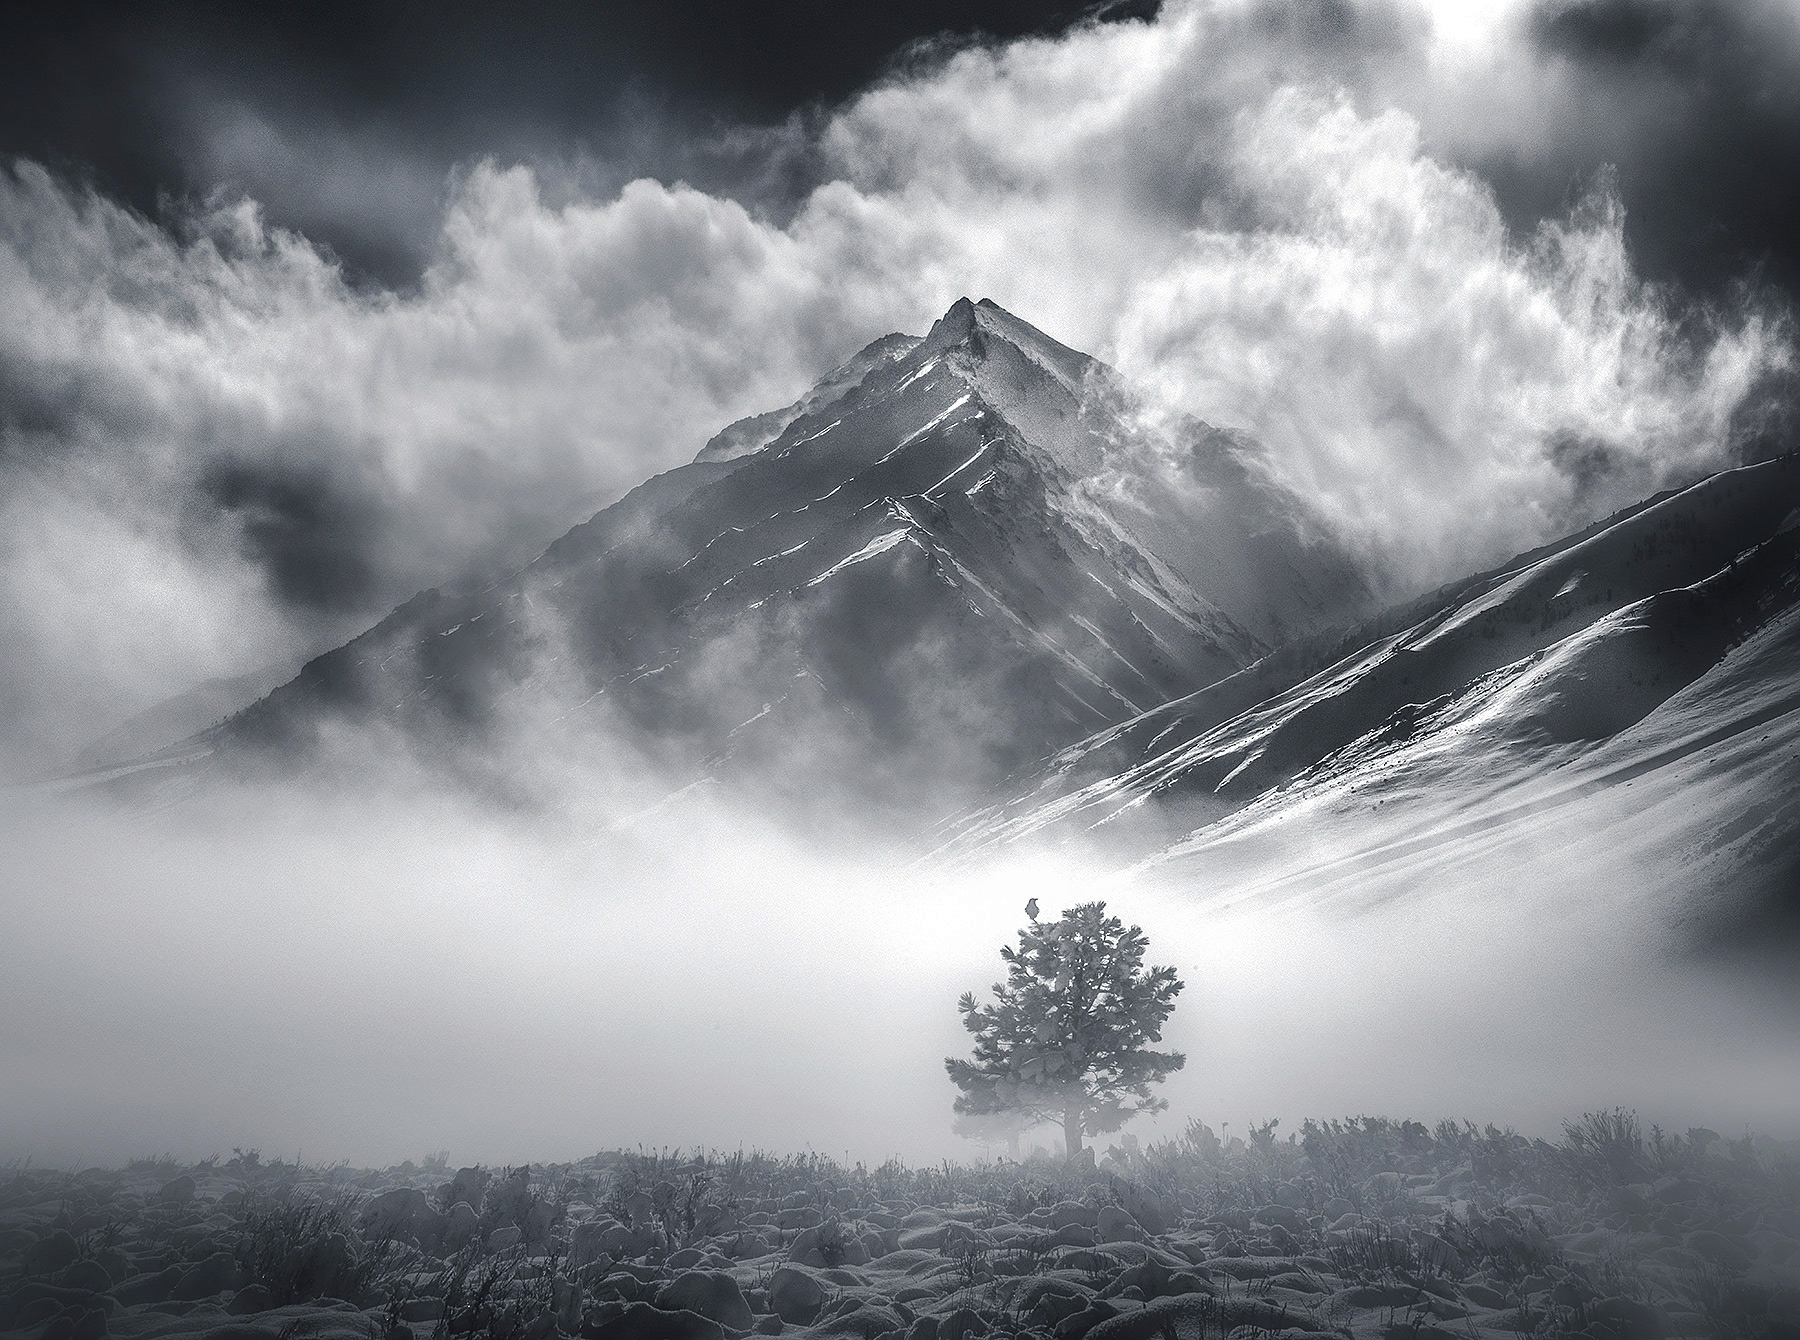 Raven, fog, peaks, Sierra, winter, photo